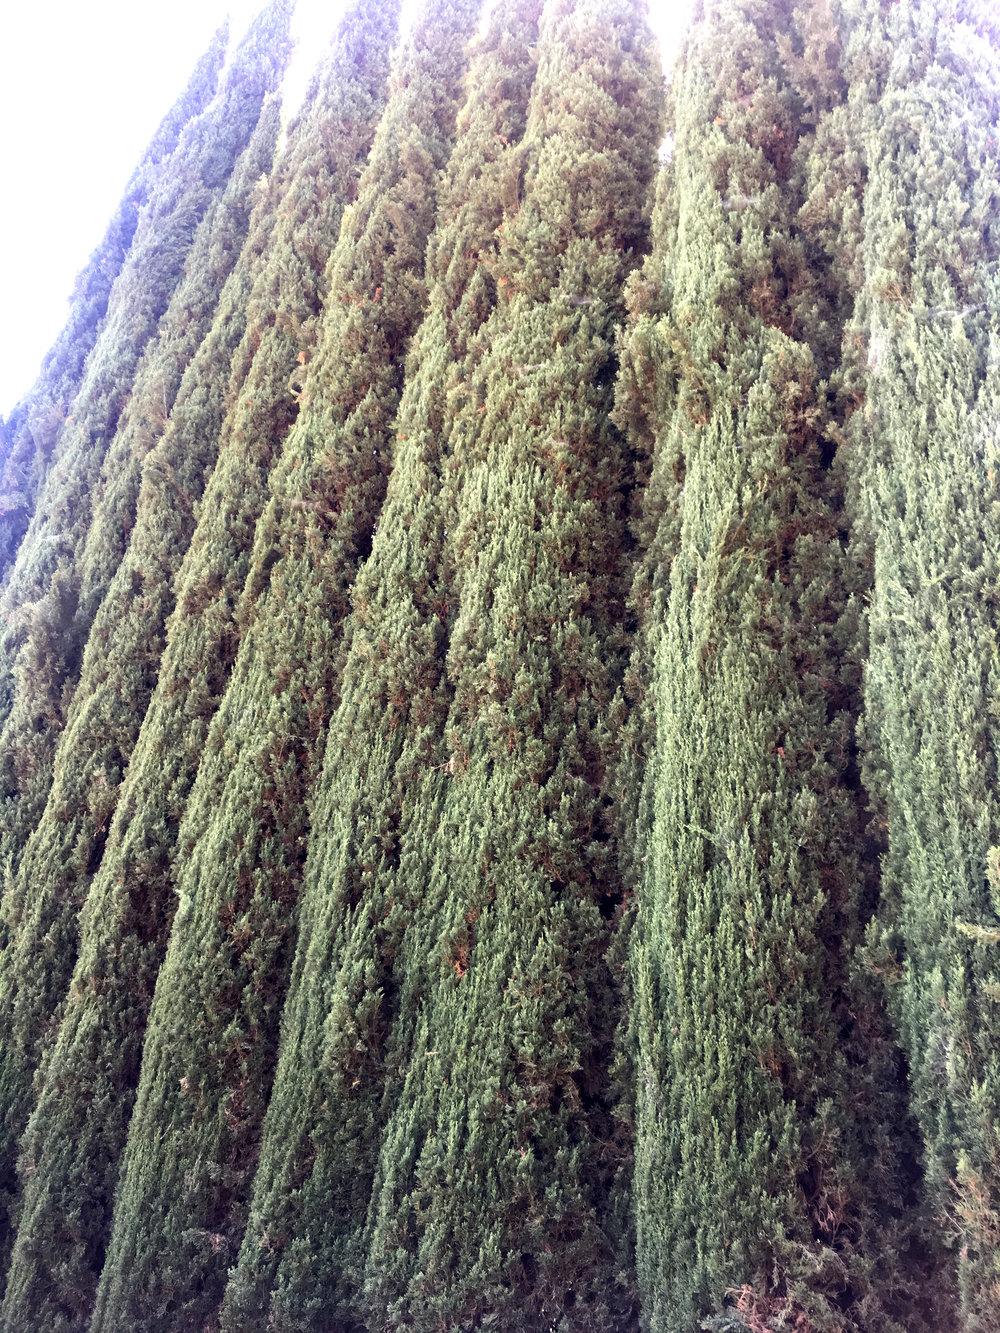 Cypress - Hydrosol - After Shave - Encintas, Ca. - Wild Craft Oils